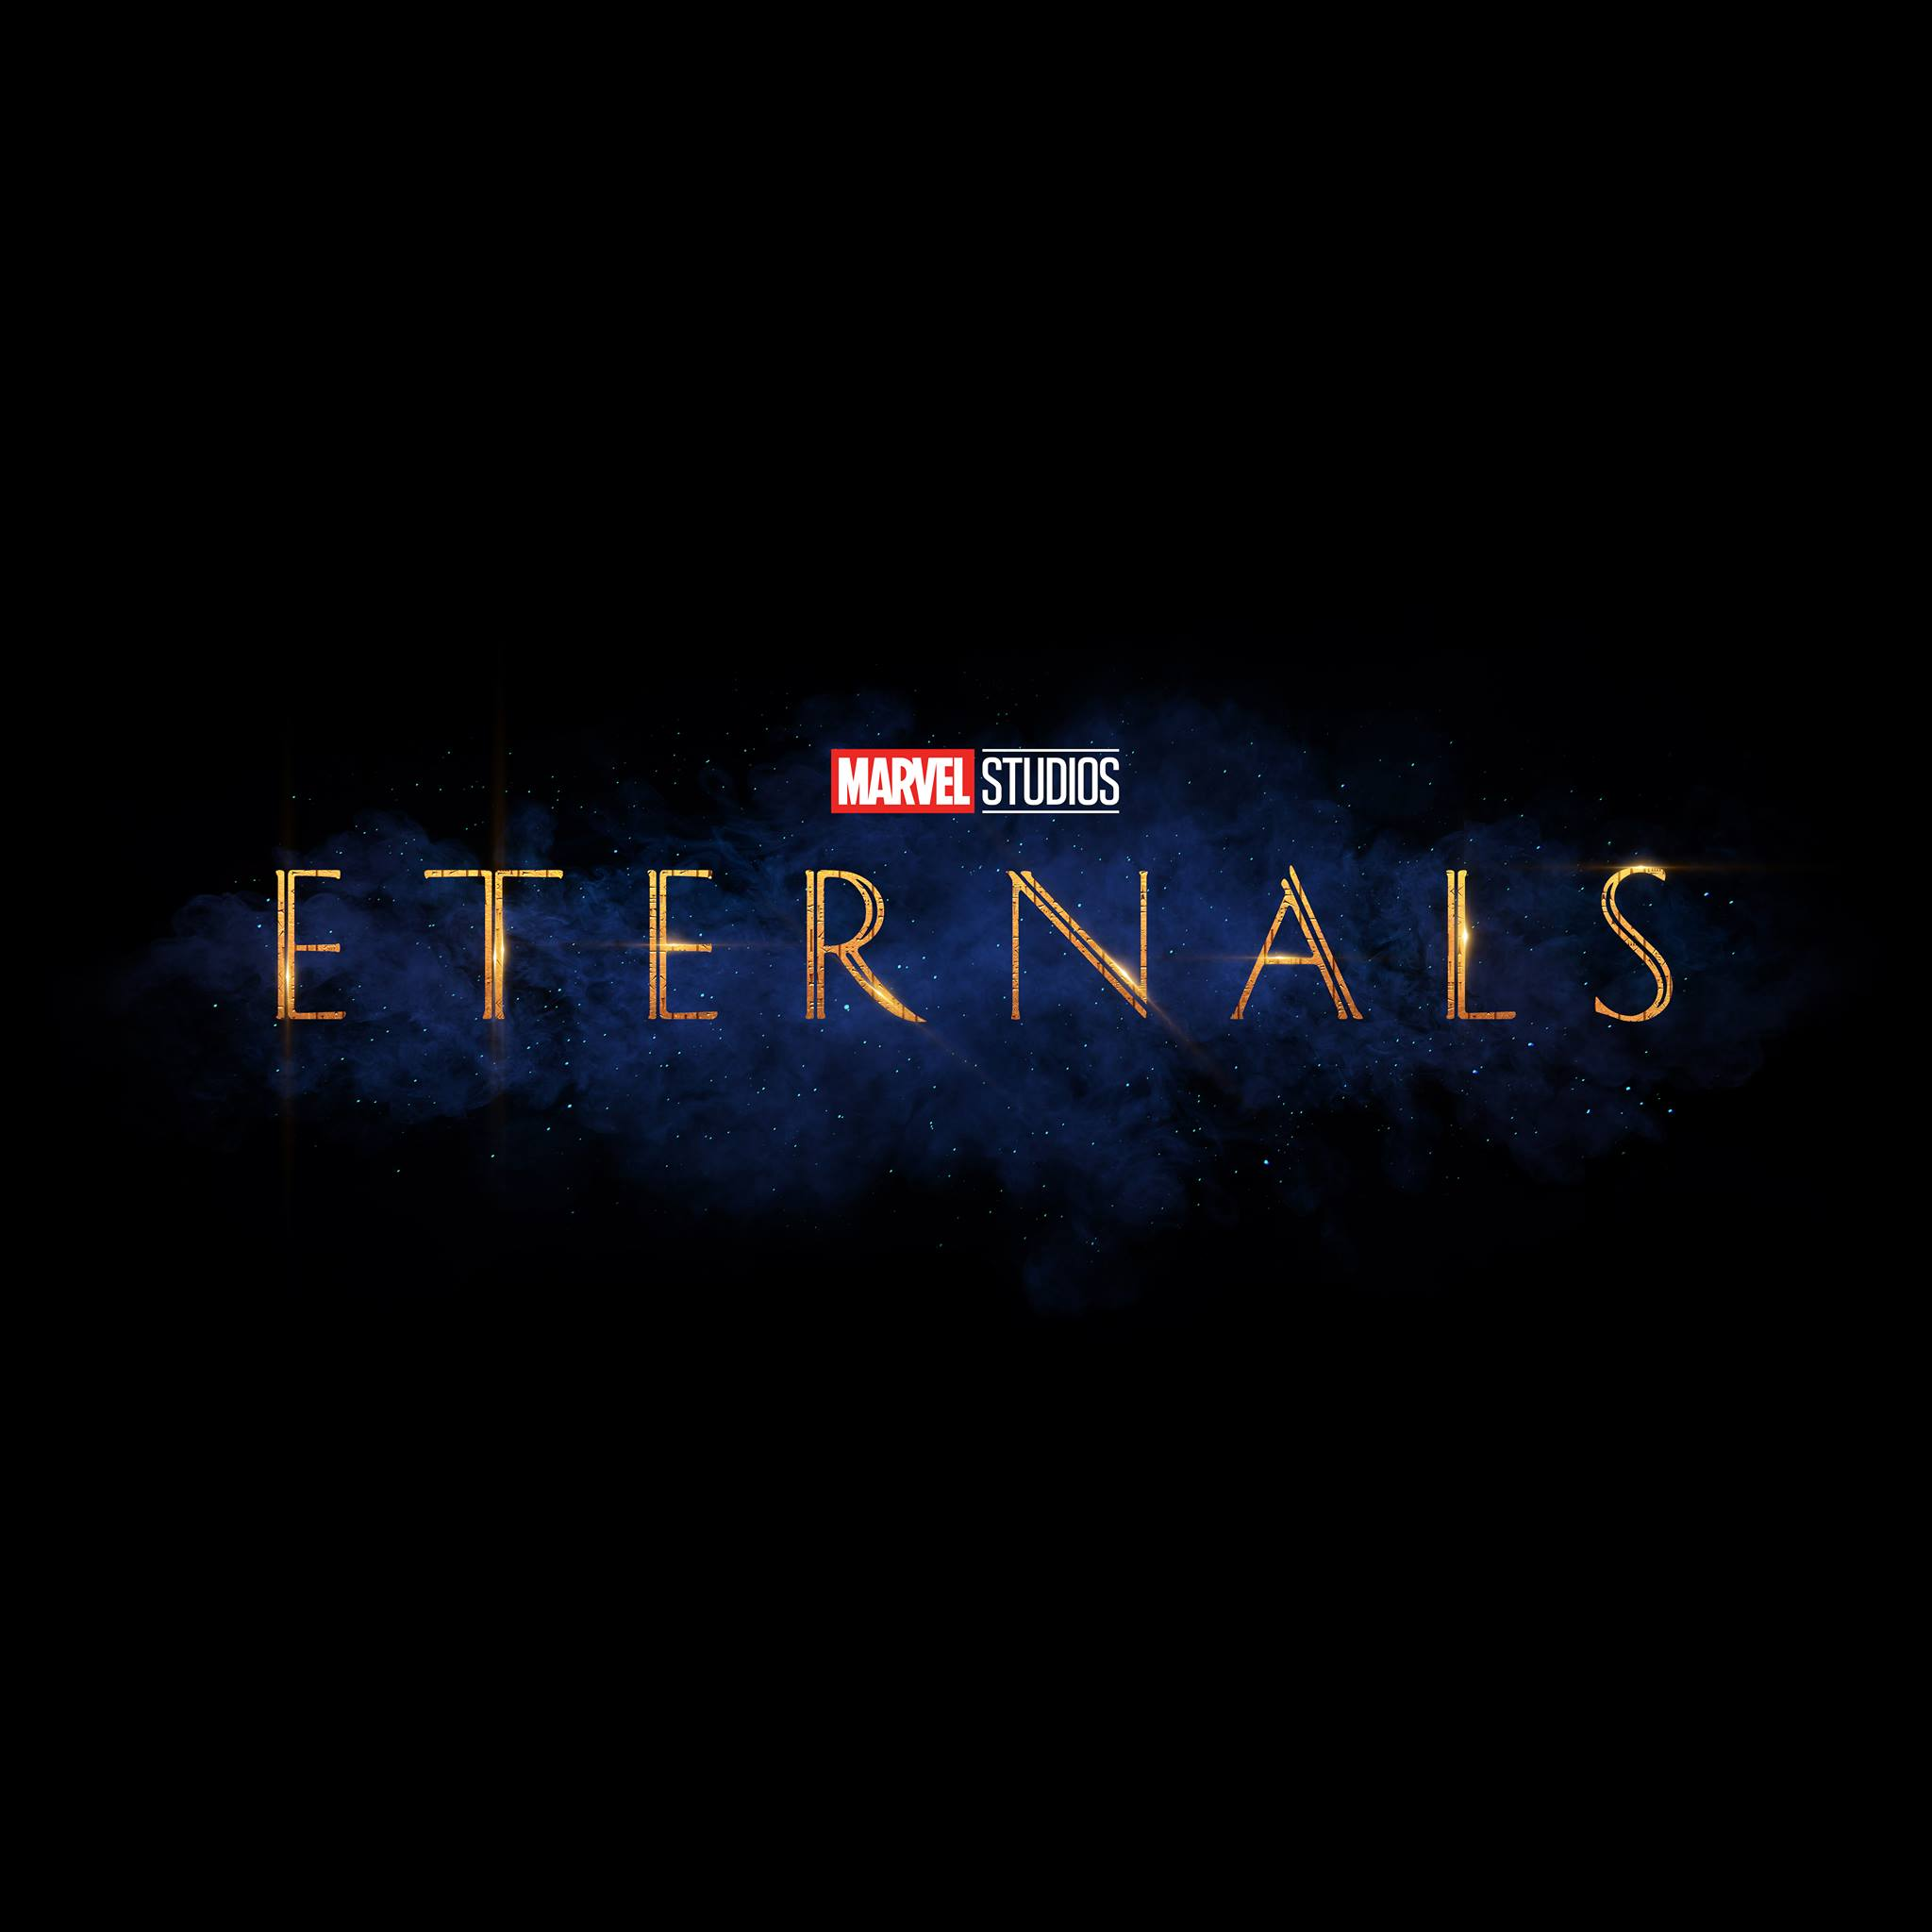 Marvel reveals post-Avengers: Endgame plans at Comic-Con 2019